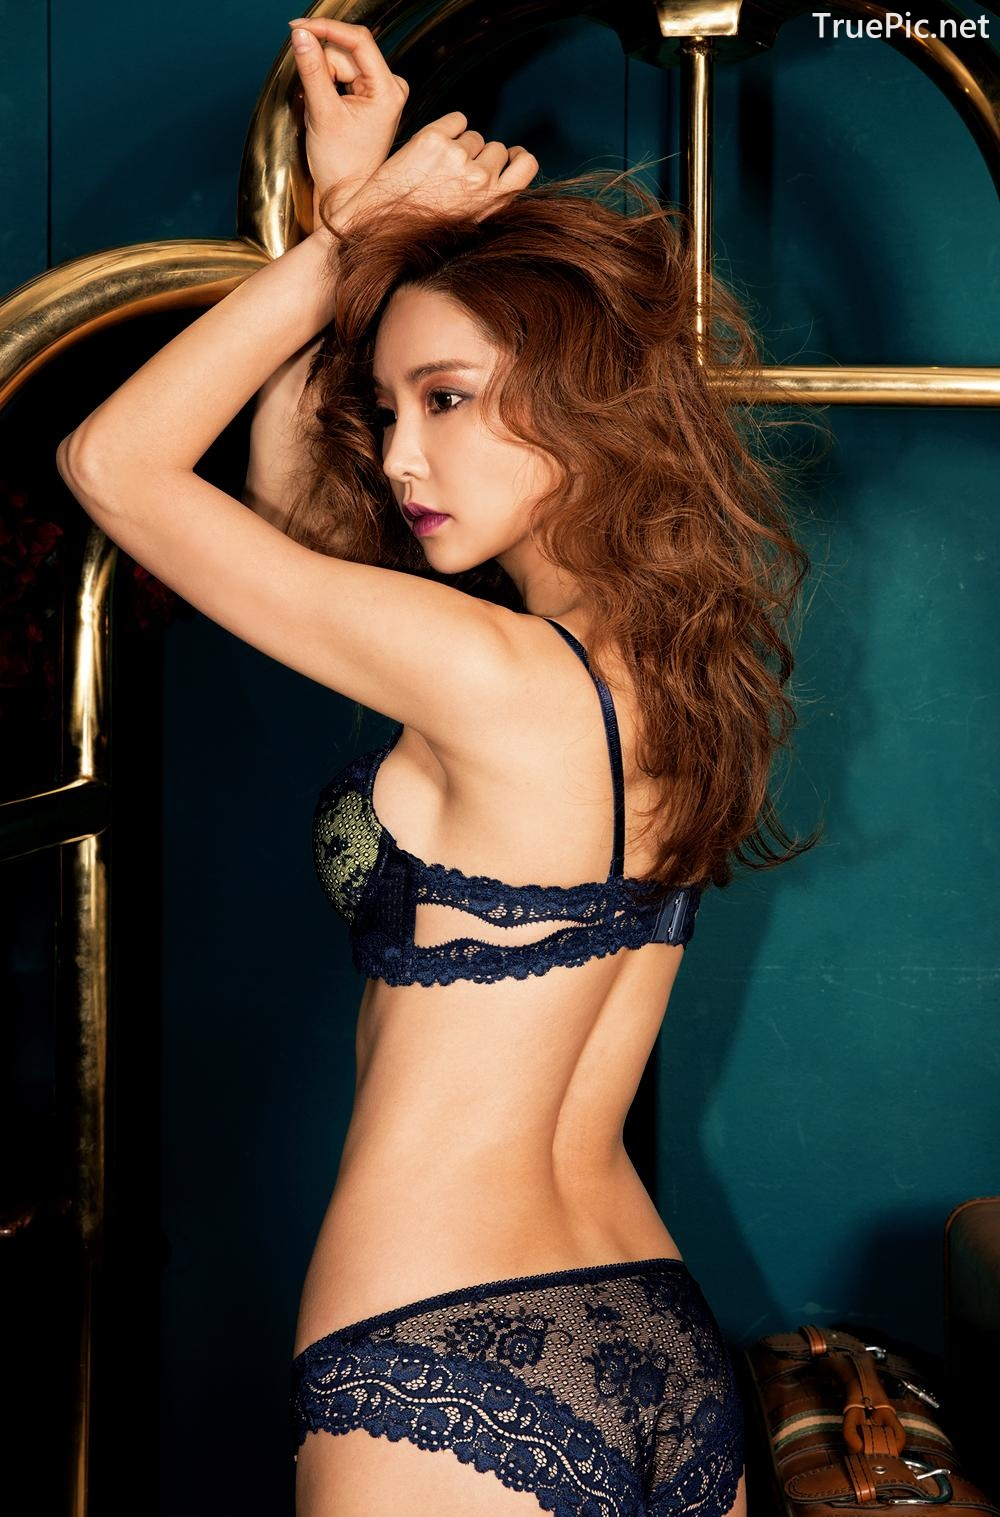 Image Korean Fashion Model - Park Soo Yeon - BVB Black Lace Lingerie - TruePic.net - Picture-3